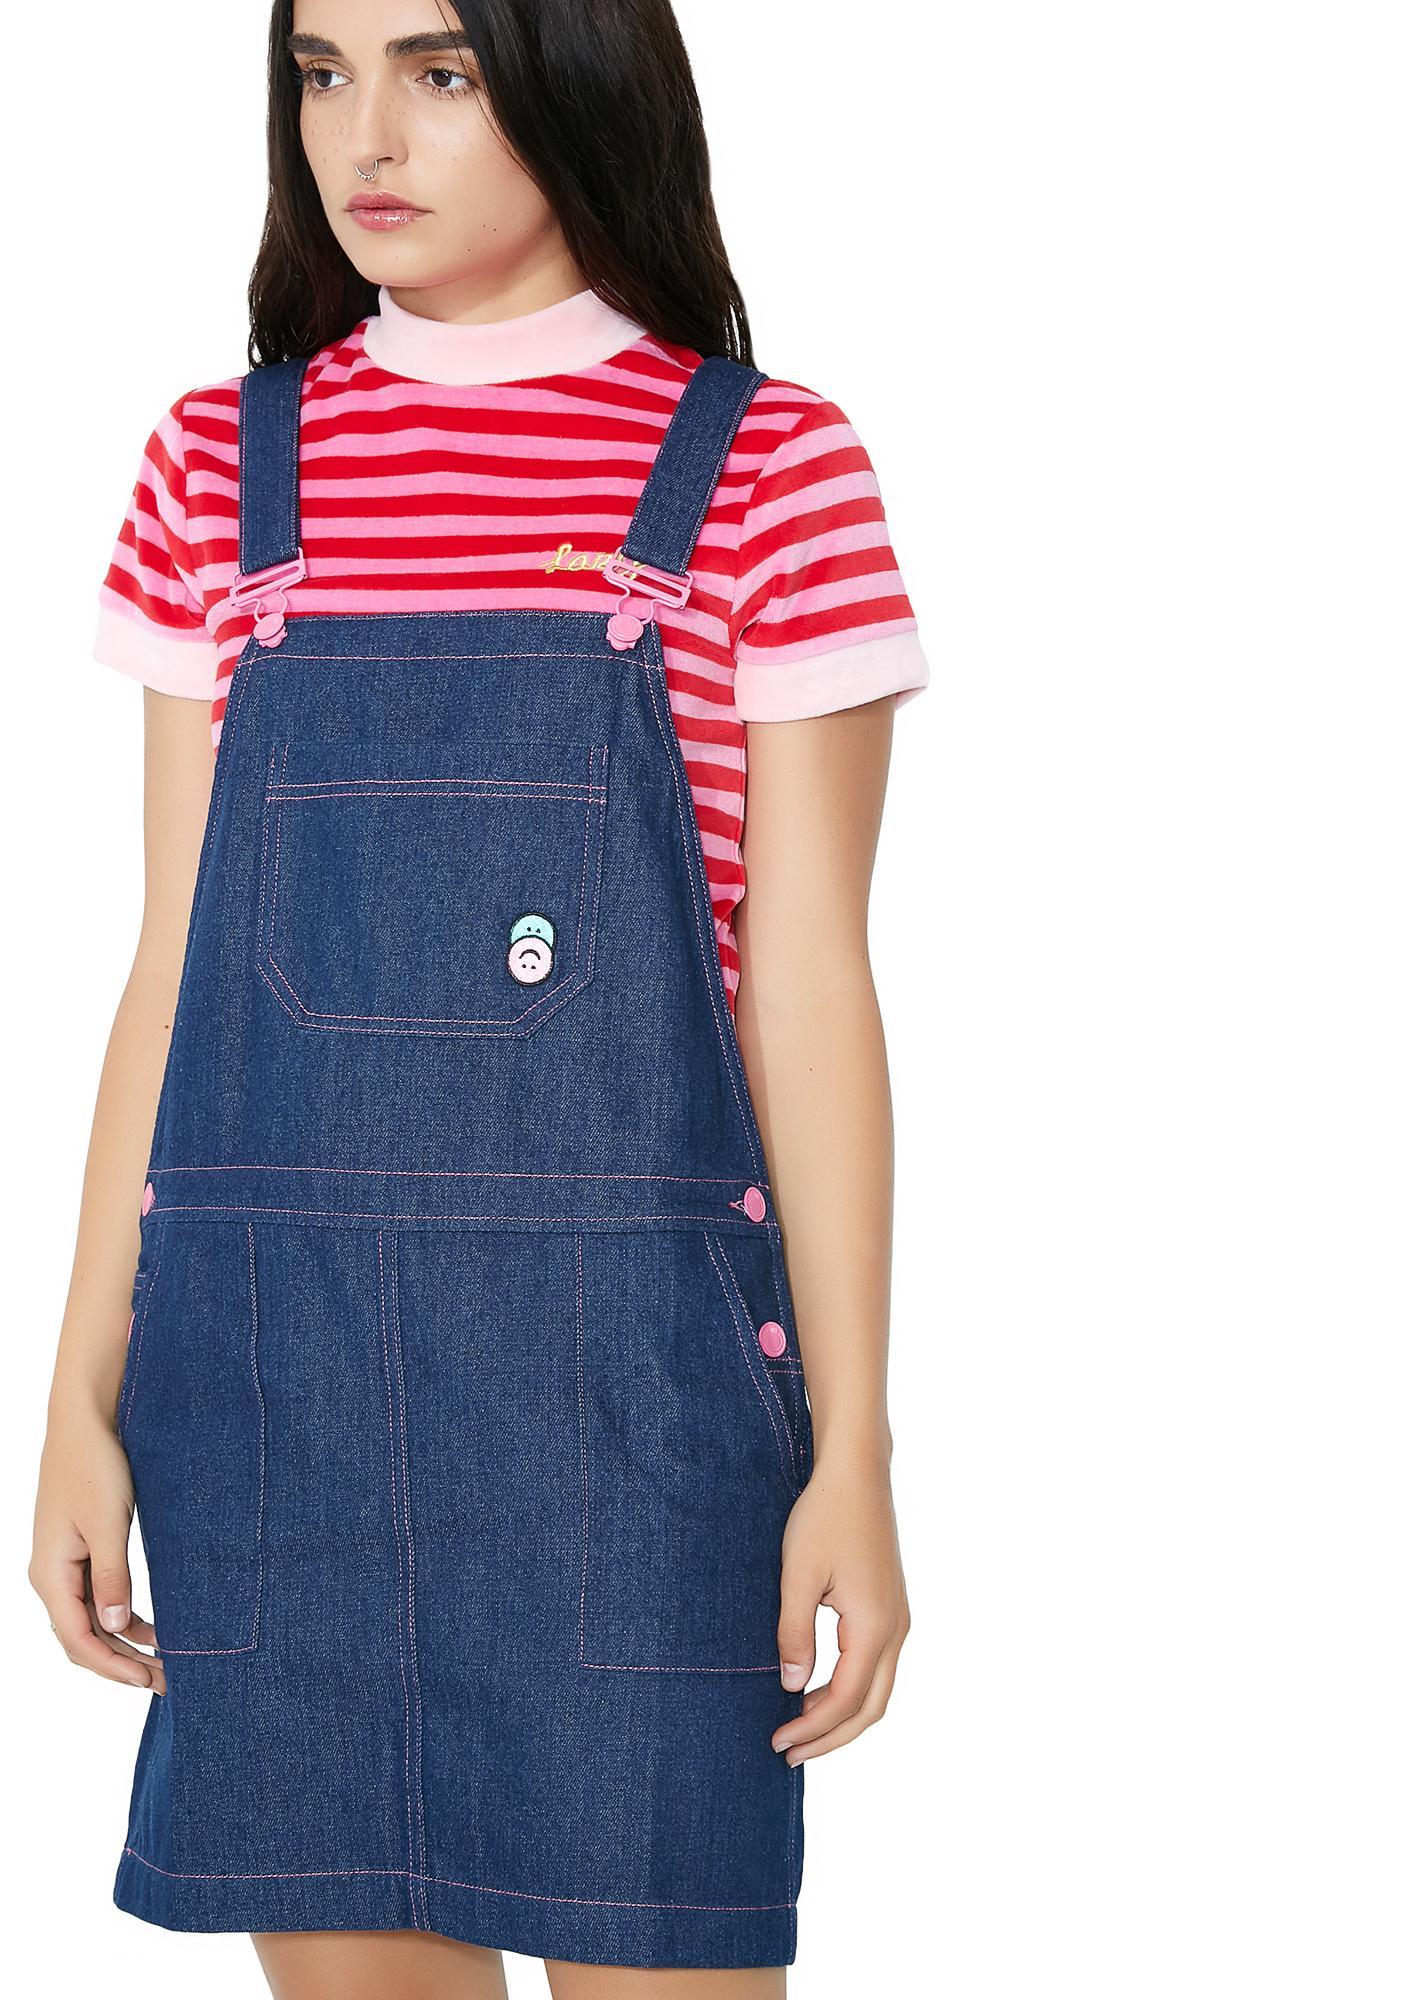 Lazy Oaf Indigo Pink Stitch Dungaree Dress